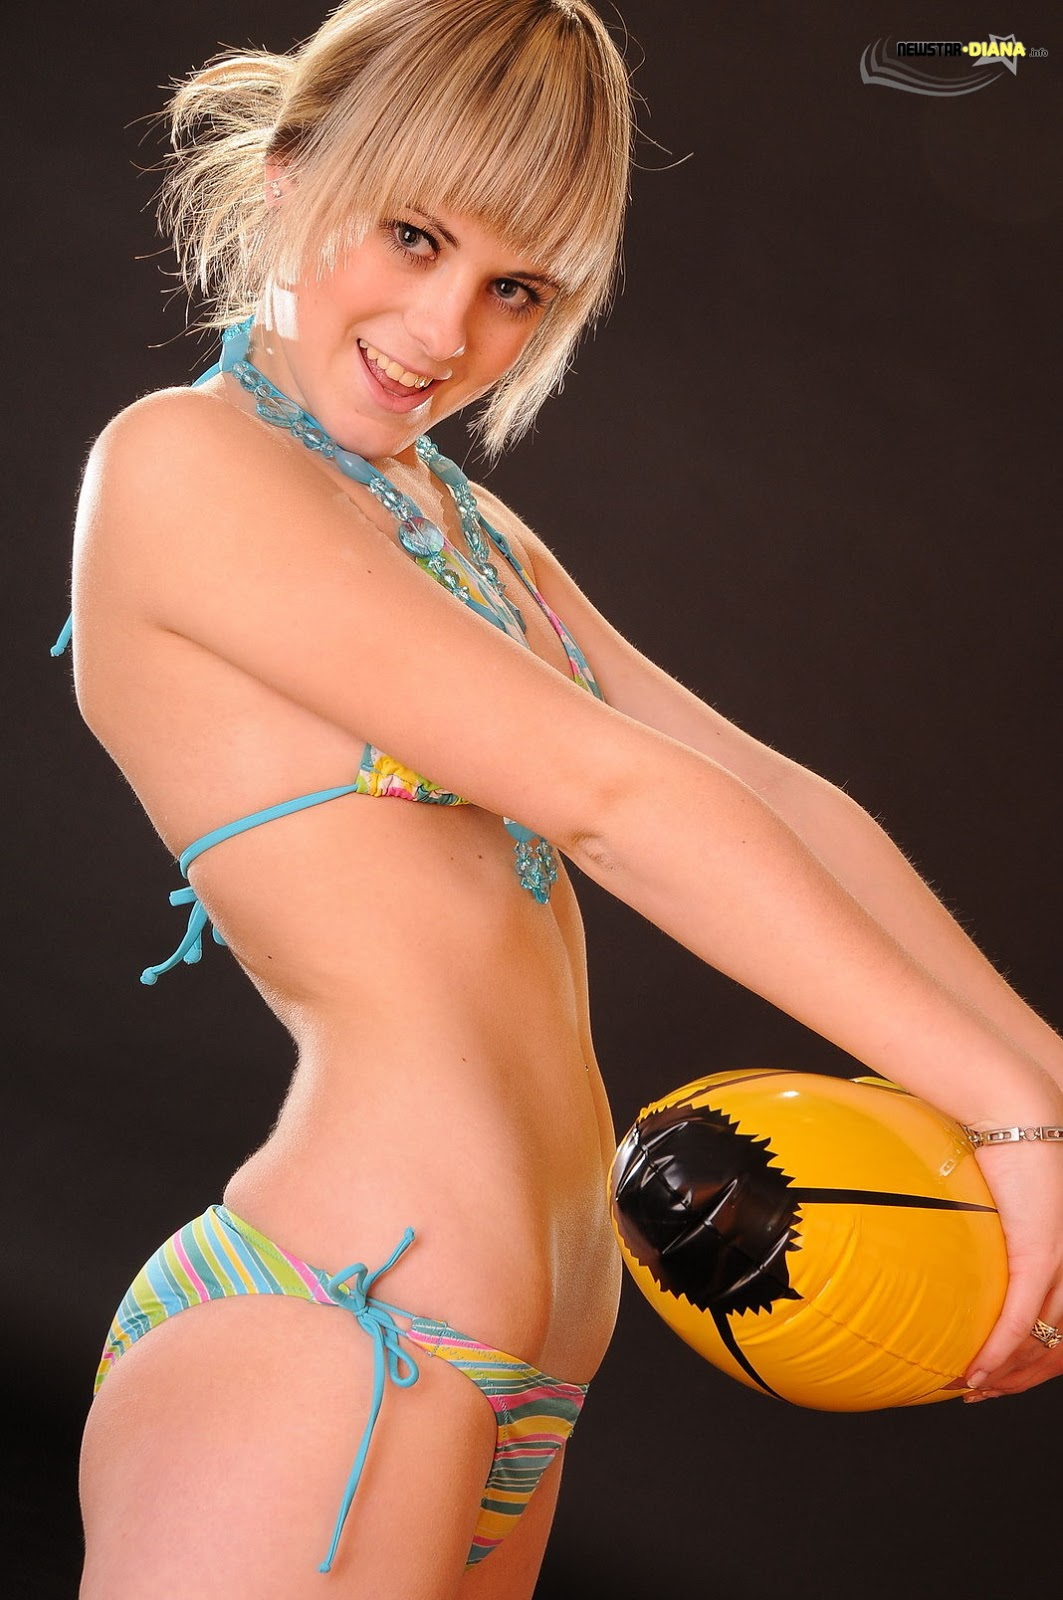 Newstar Diana Nude